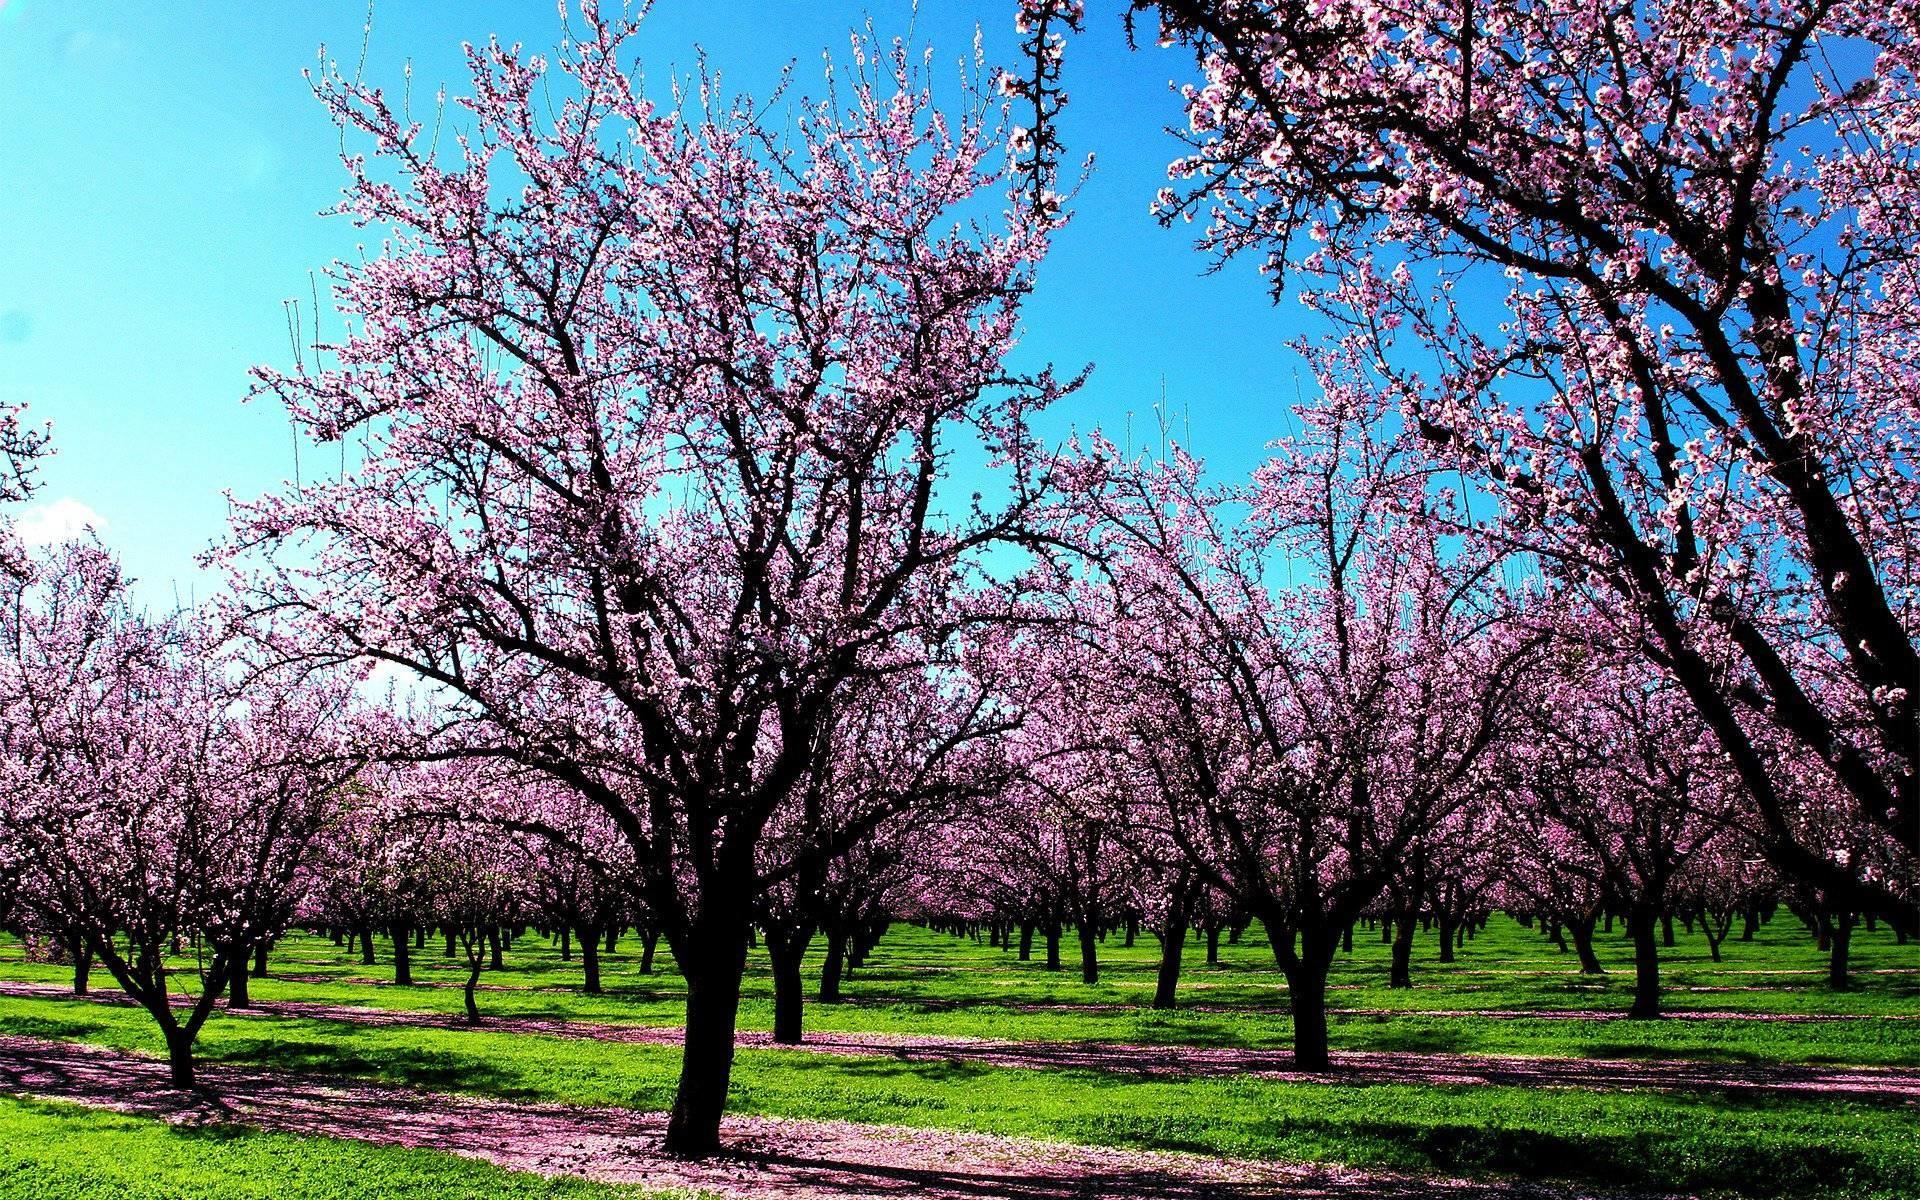 Spring Trees Wallpaper Desktop Hd Widescreen 10 HD Wallpapers .